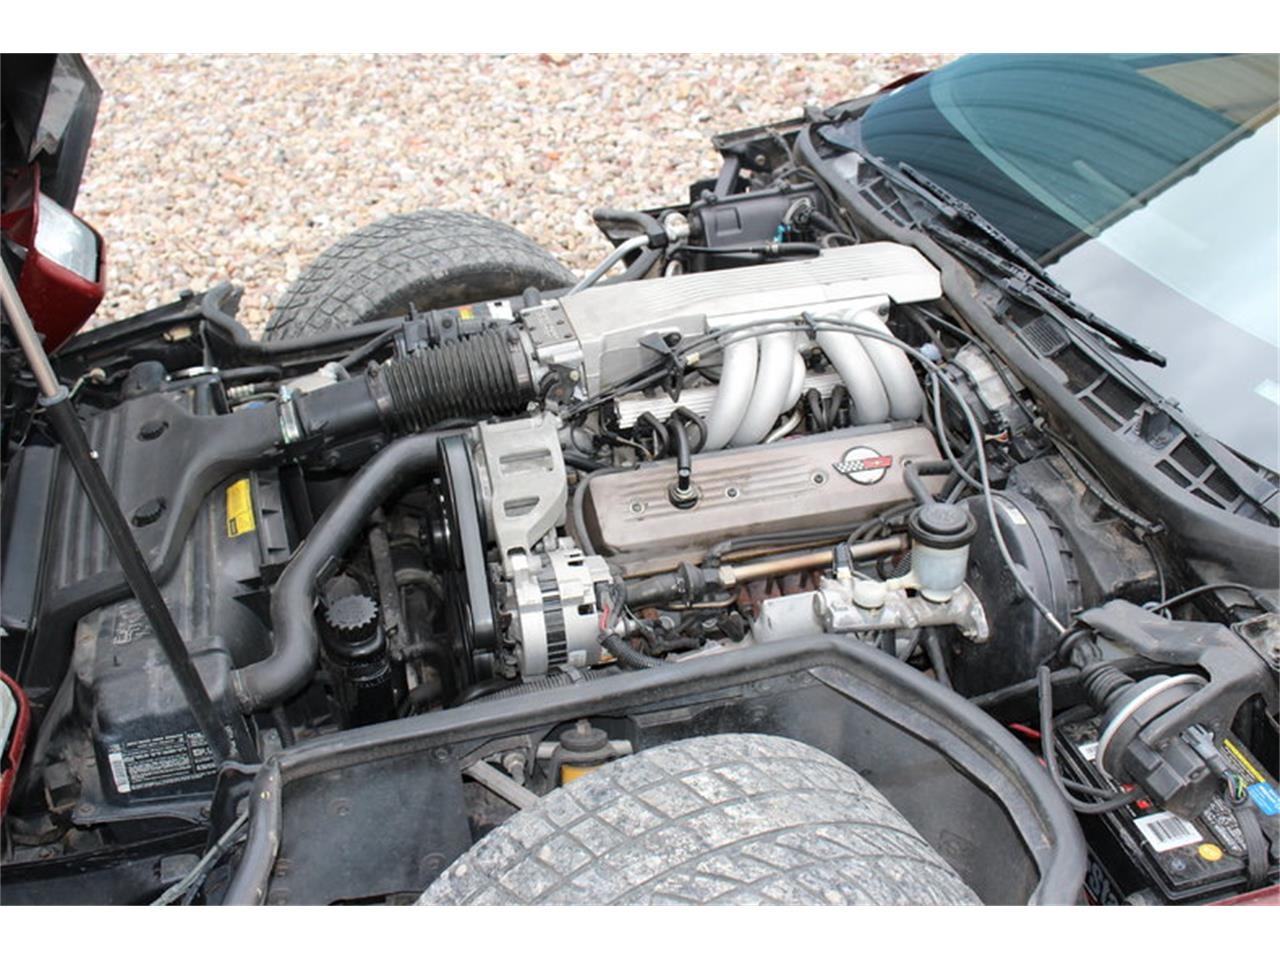 Large Picture of '86 Chevrolet Corvette located in Vernal Utah - $7,995.00 - J45B